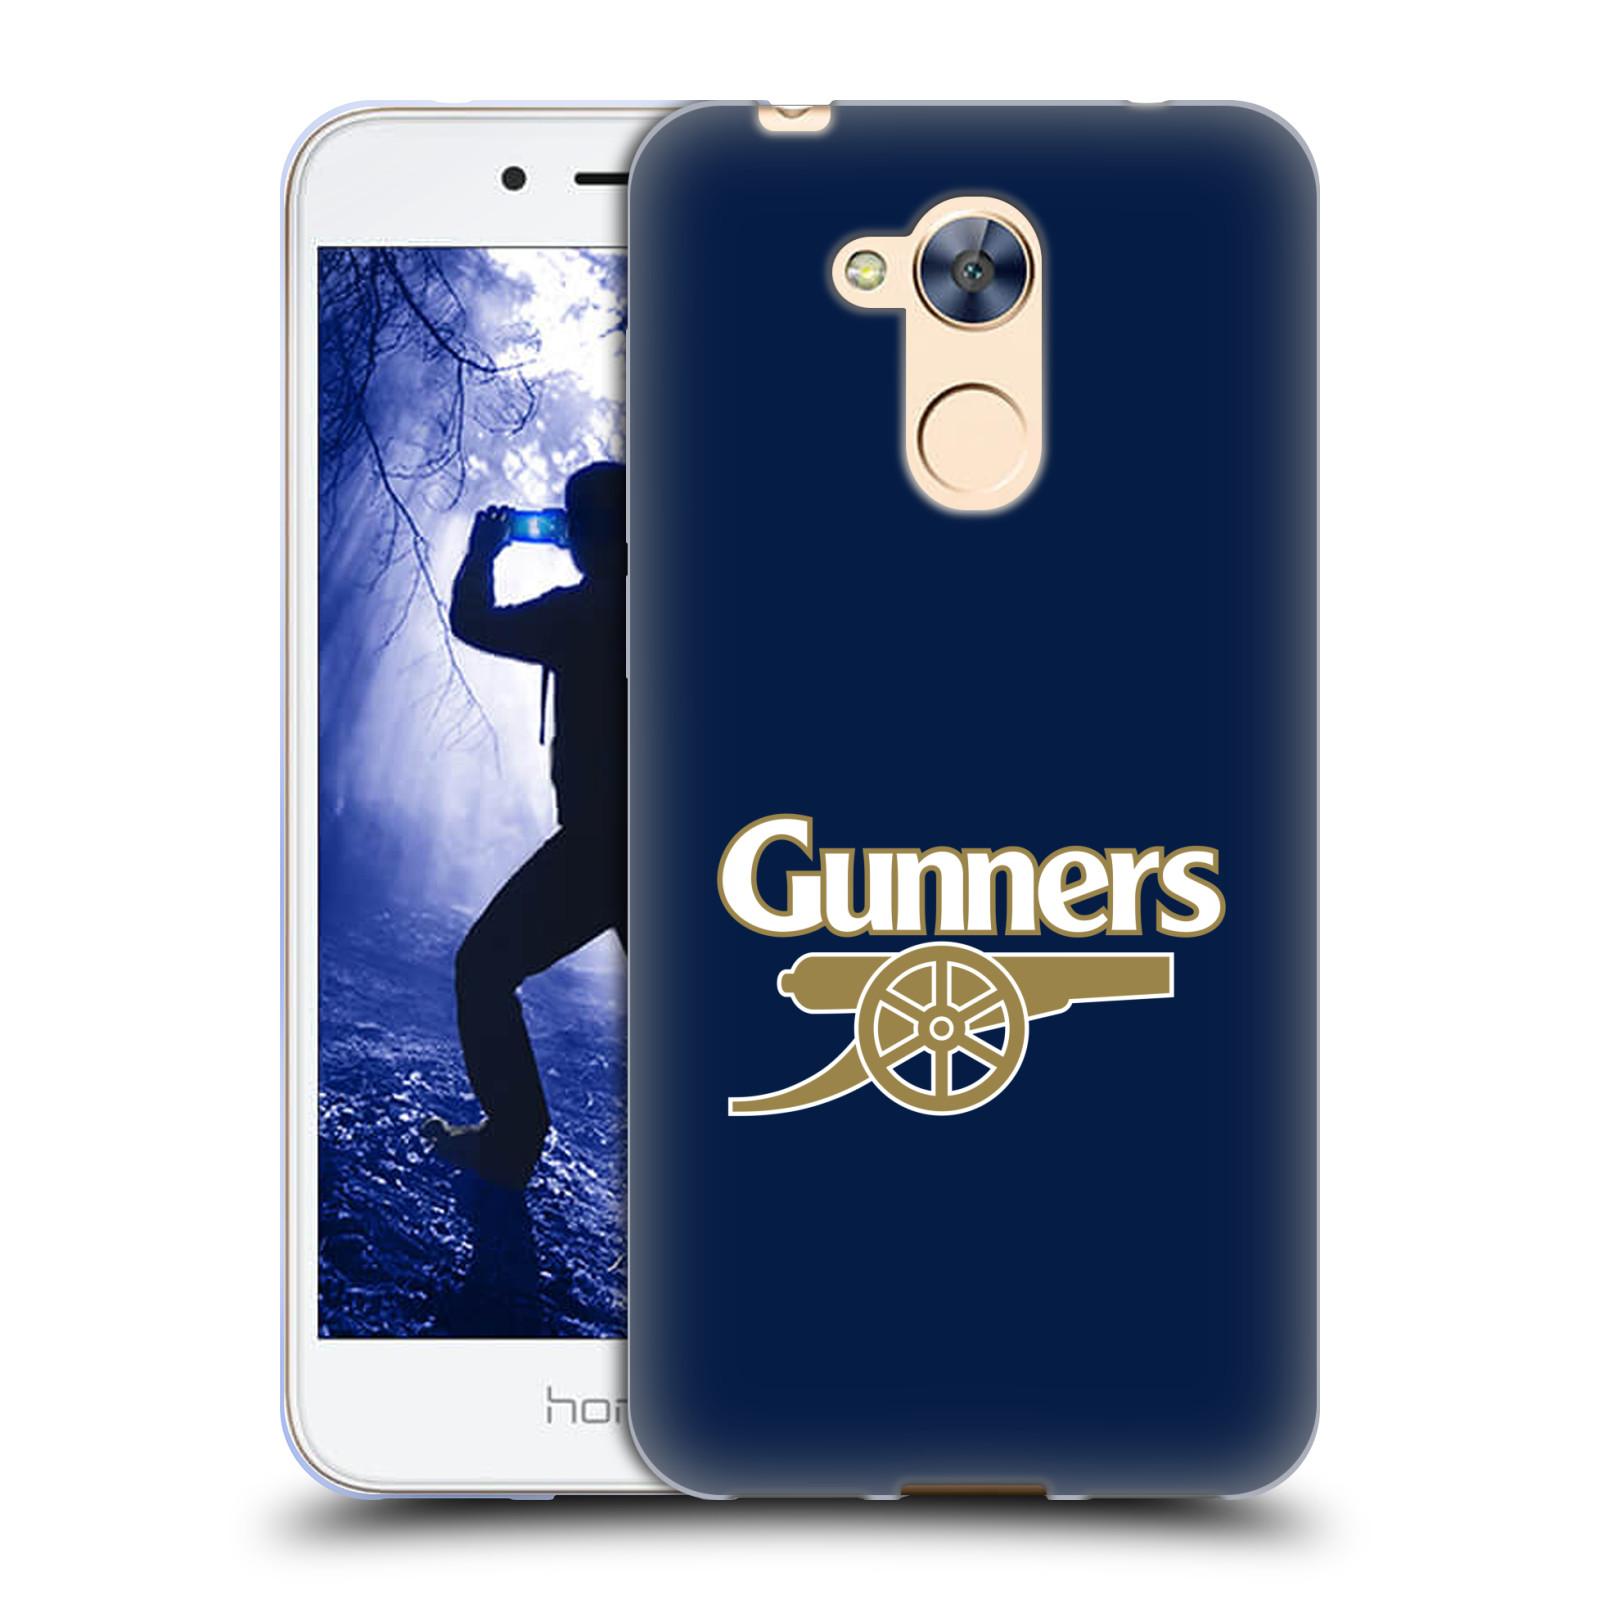 Silikonové pouzdro na mobil Honor 6A - Head Case - Arsenal FC - Gunners